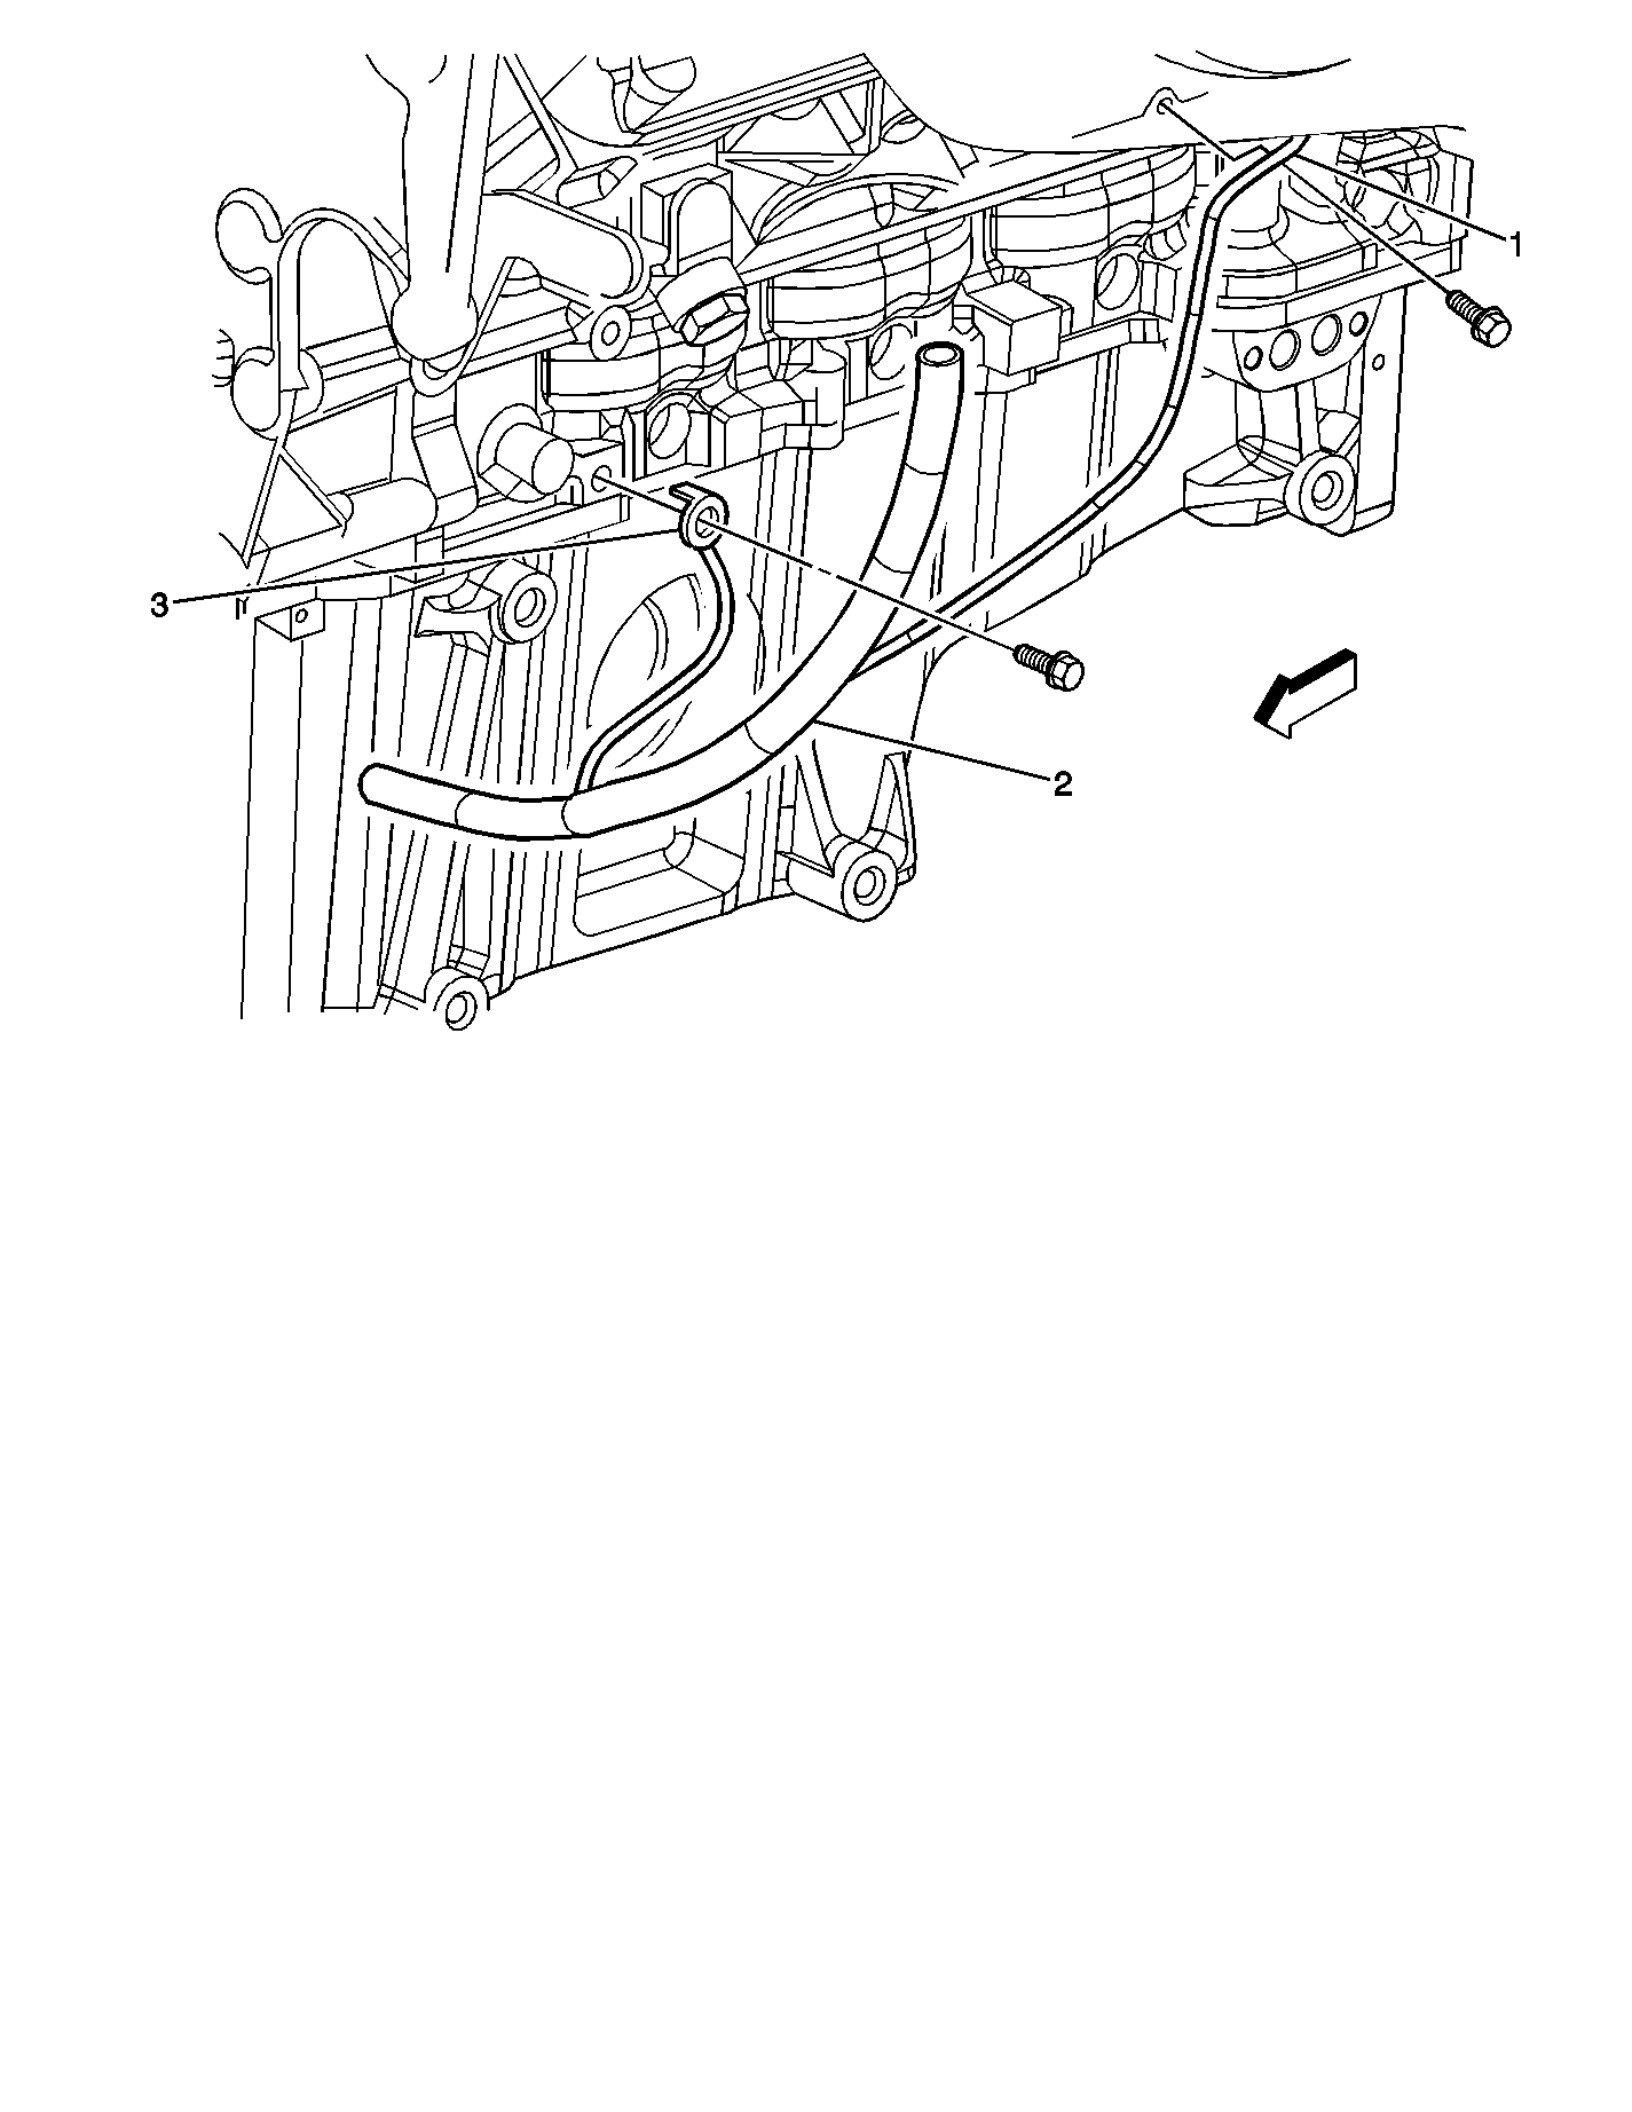 Wonderful 2006 Trailblazer Wiring Diagram Gallery - ufc204.us ...